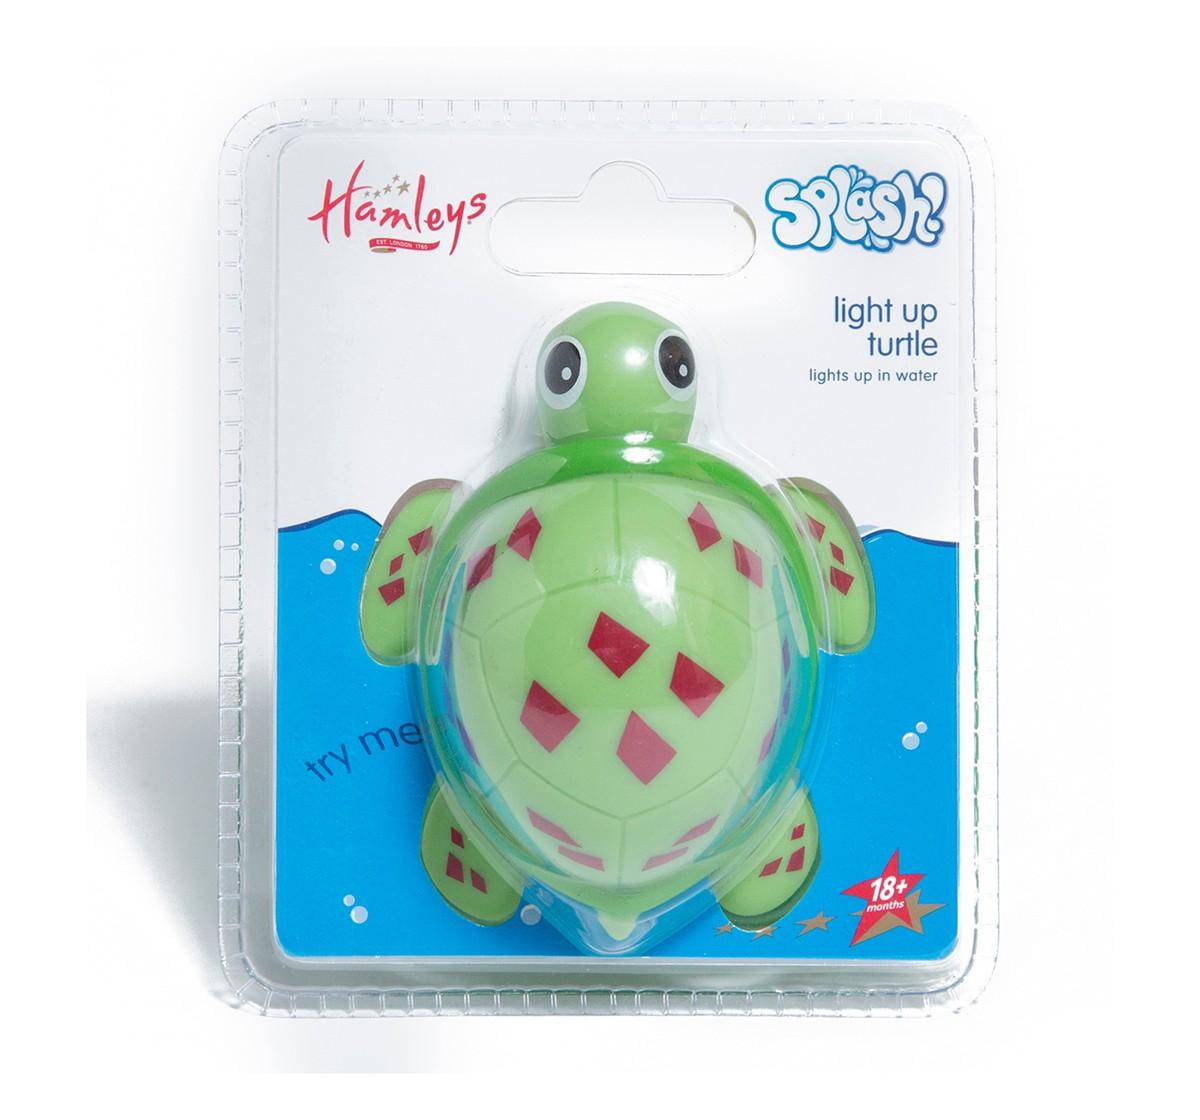 Hamleys Splash Light Up Turtle  -Green Bath Toys & Accessories for Kids age 18M + (Green)